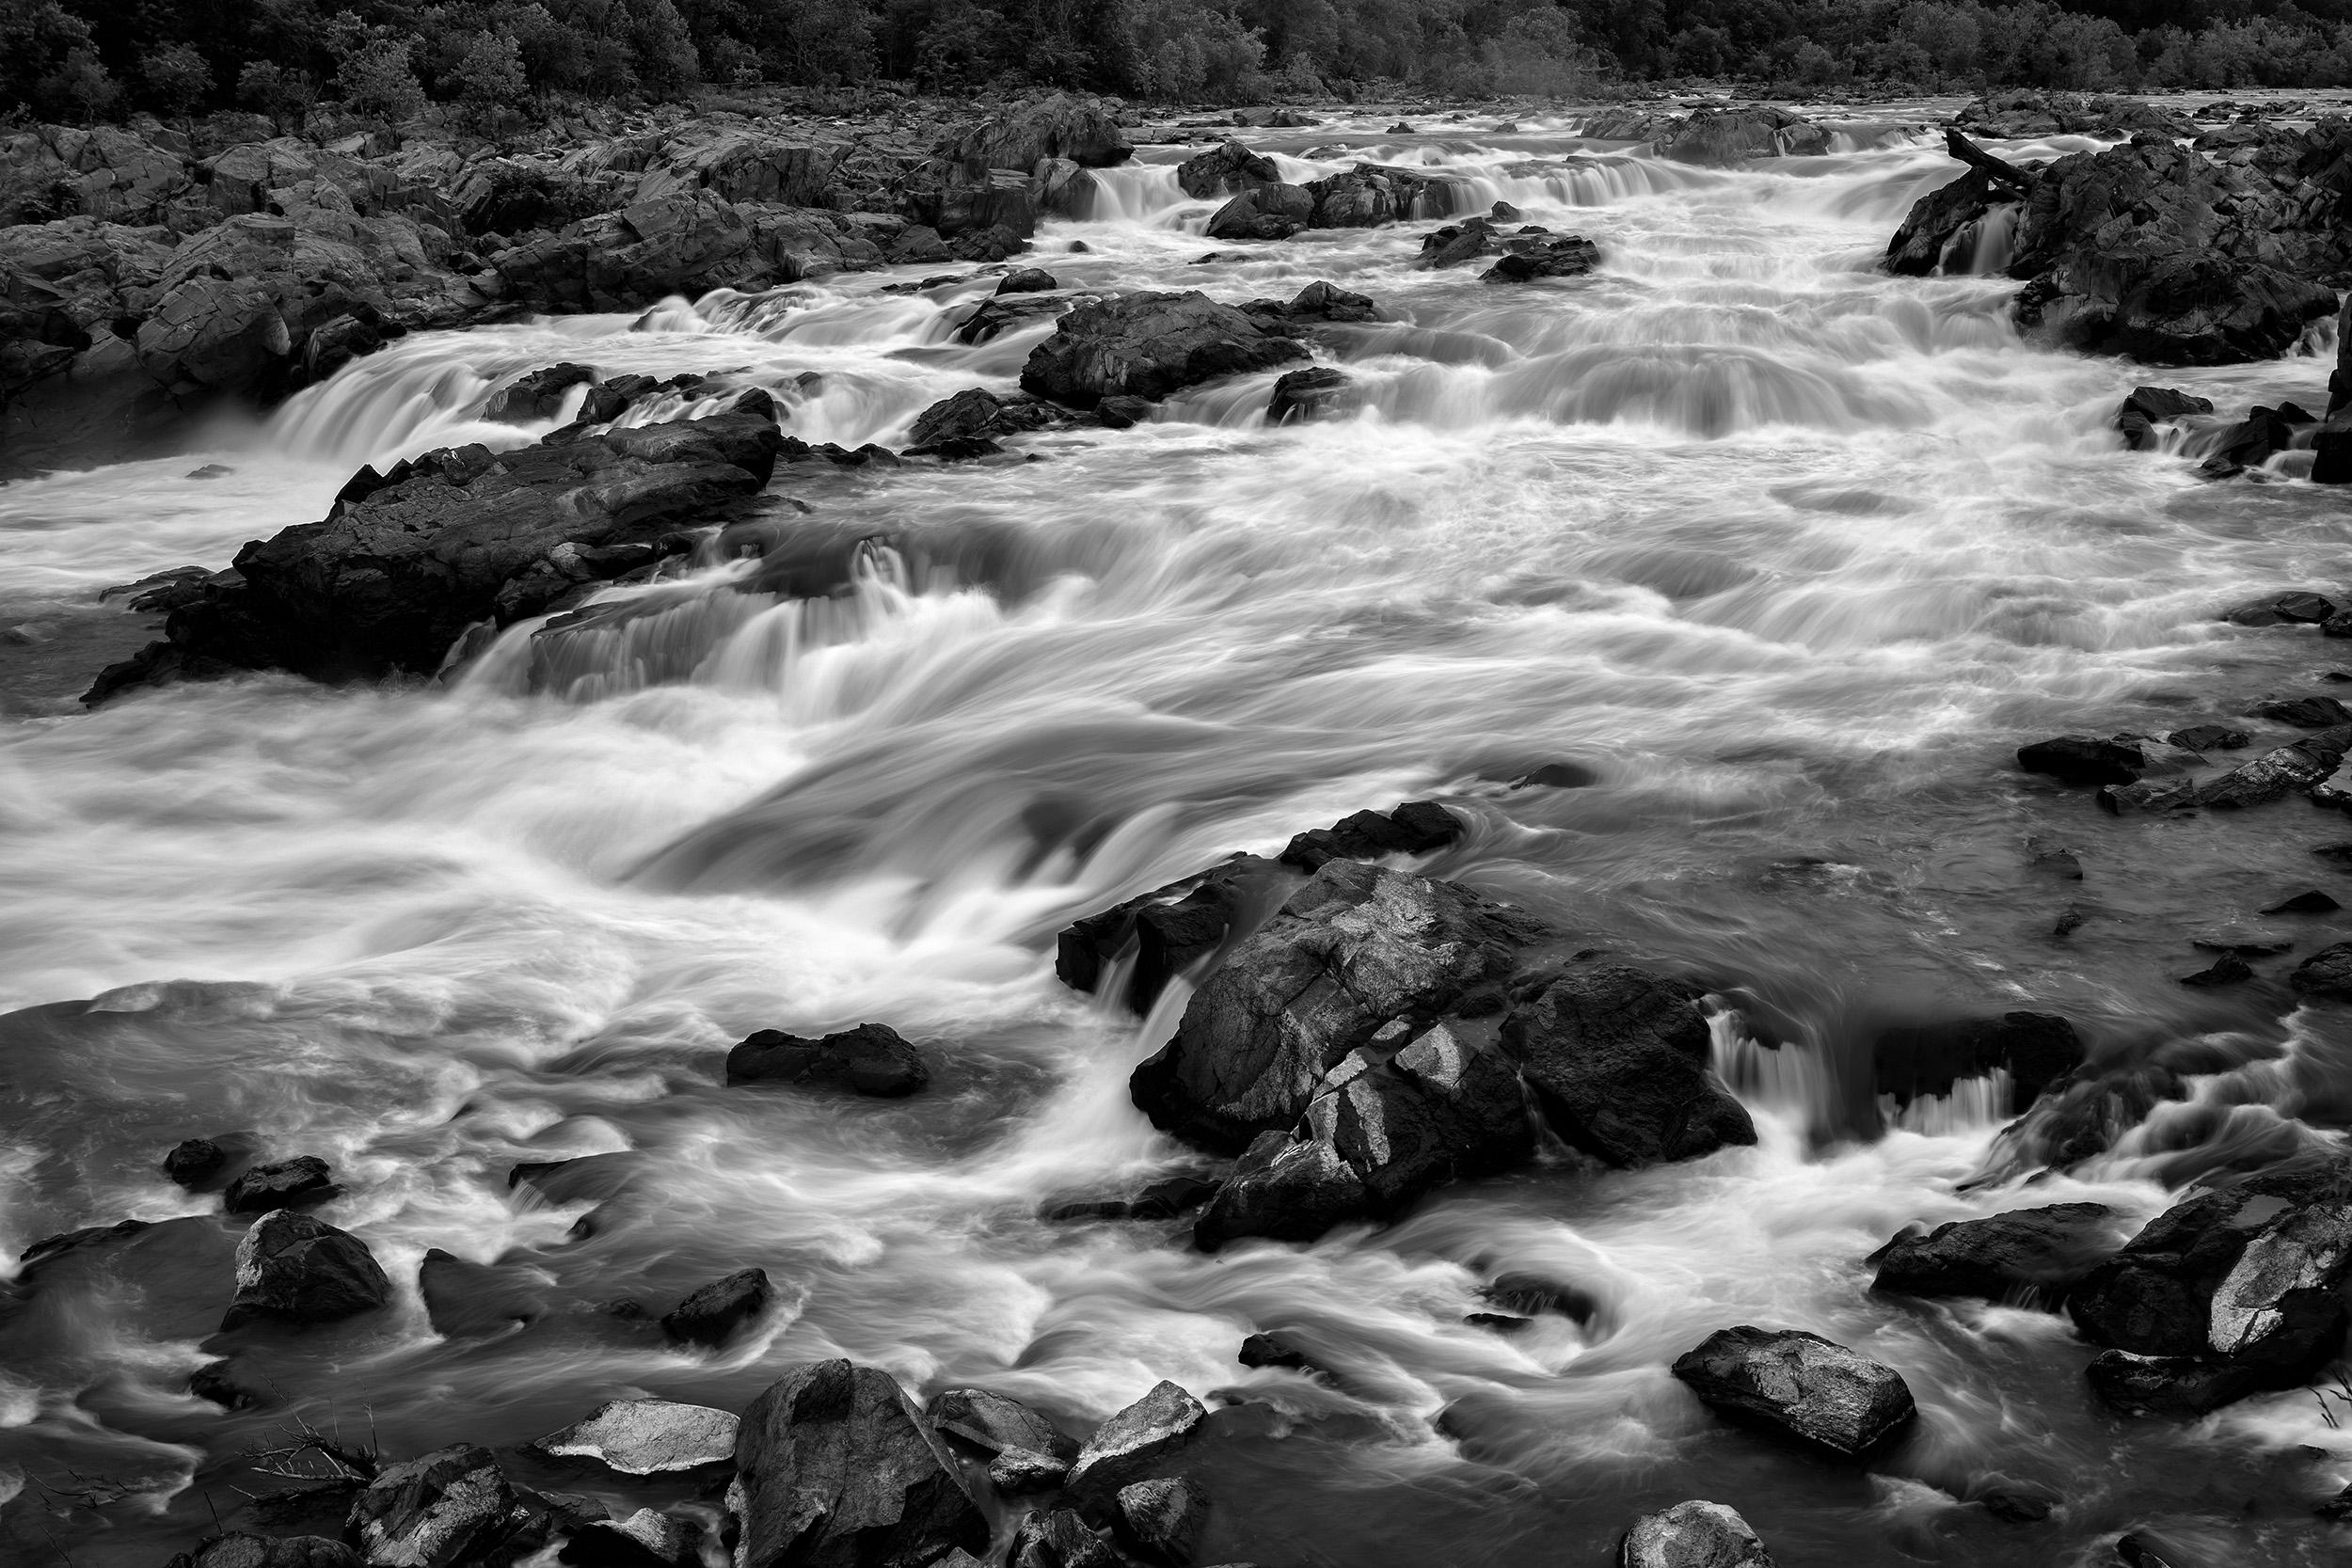 190527 Great Falls 15-1 flt bw.jpg